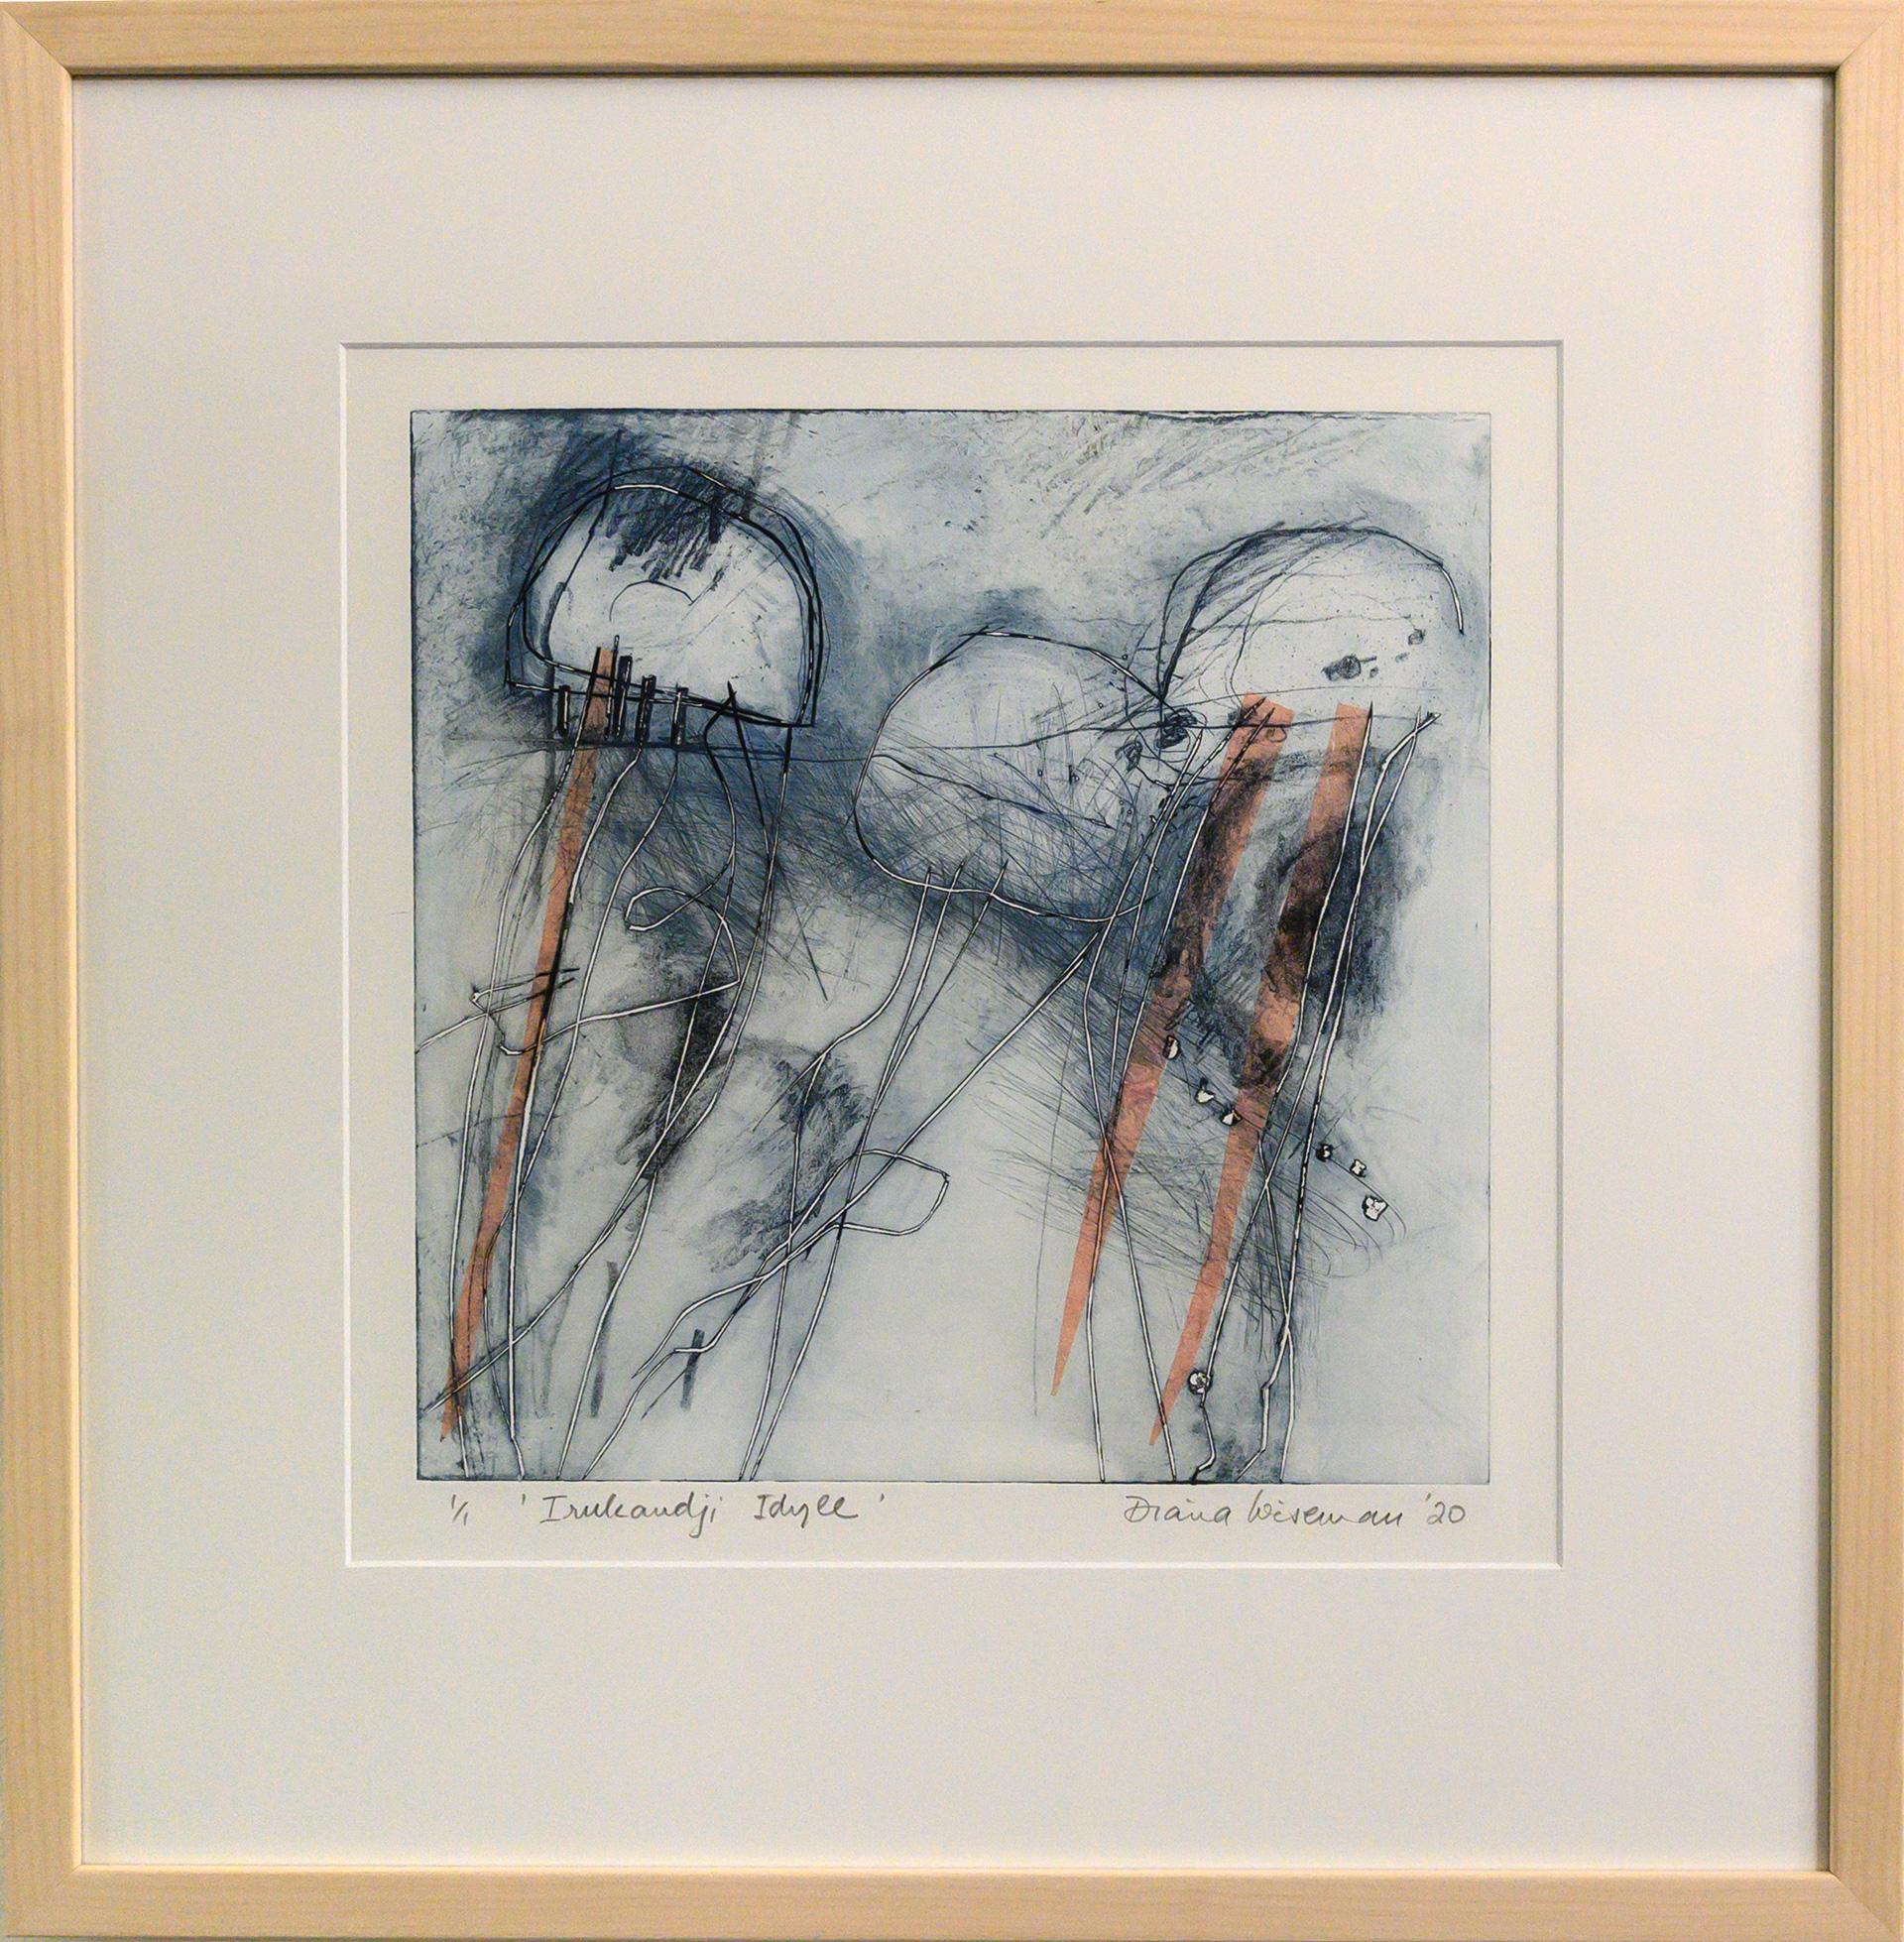 Framed artwork by Diana Wiseman of 3 jellyfish